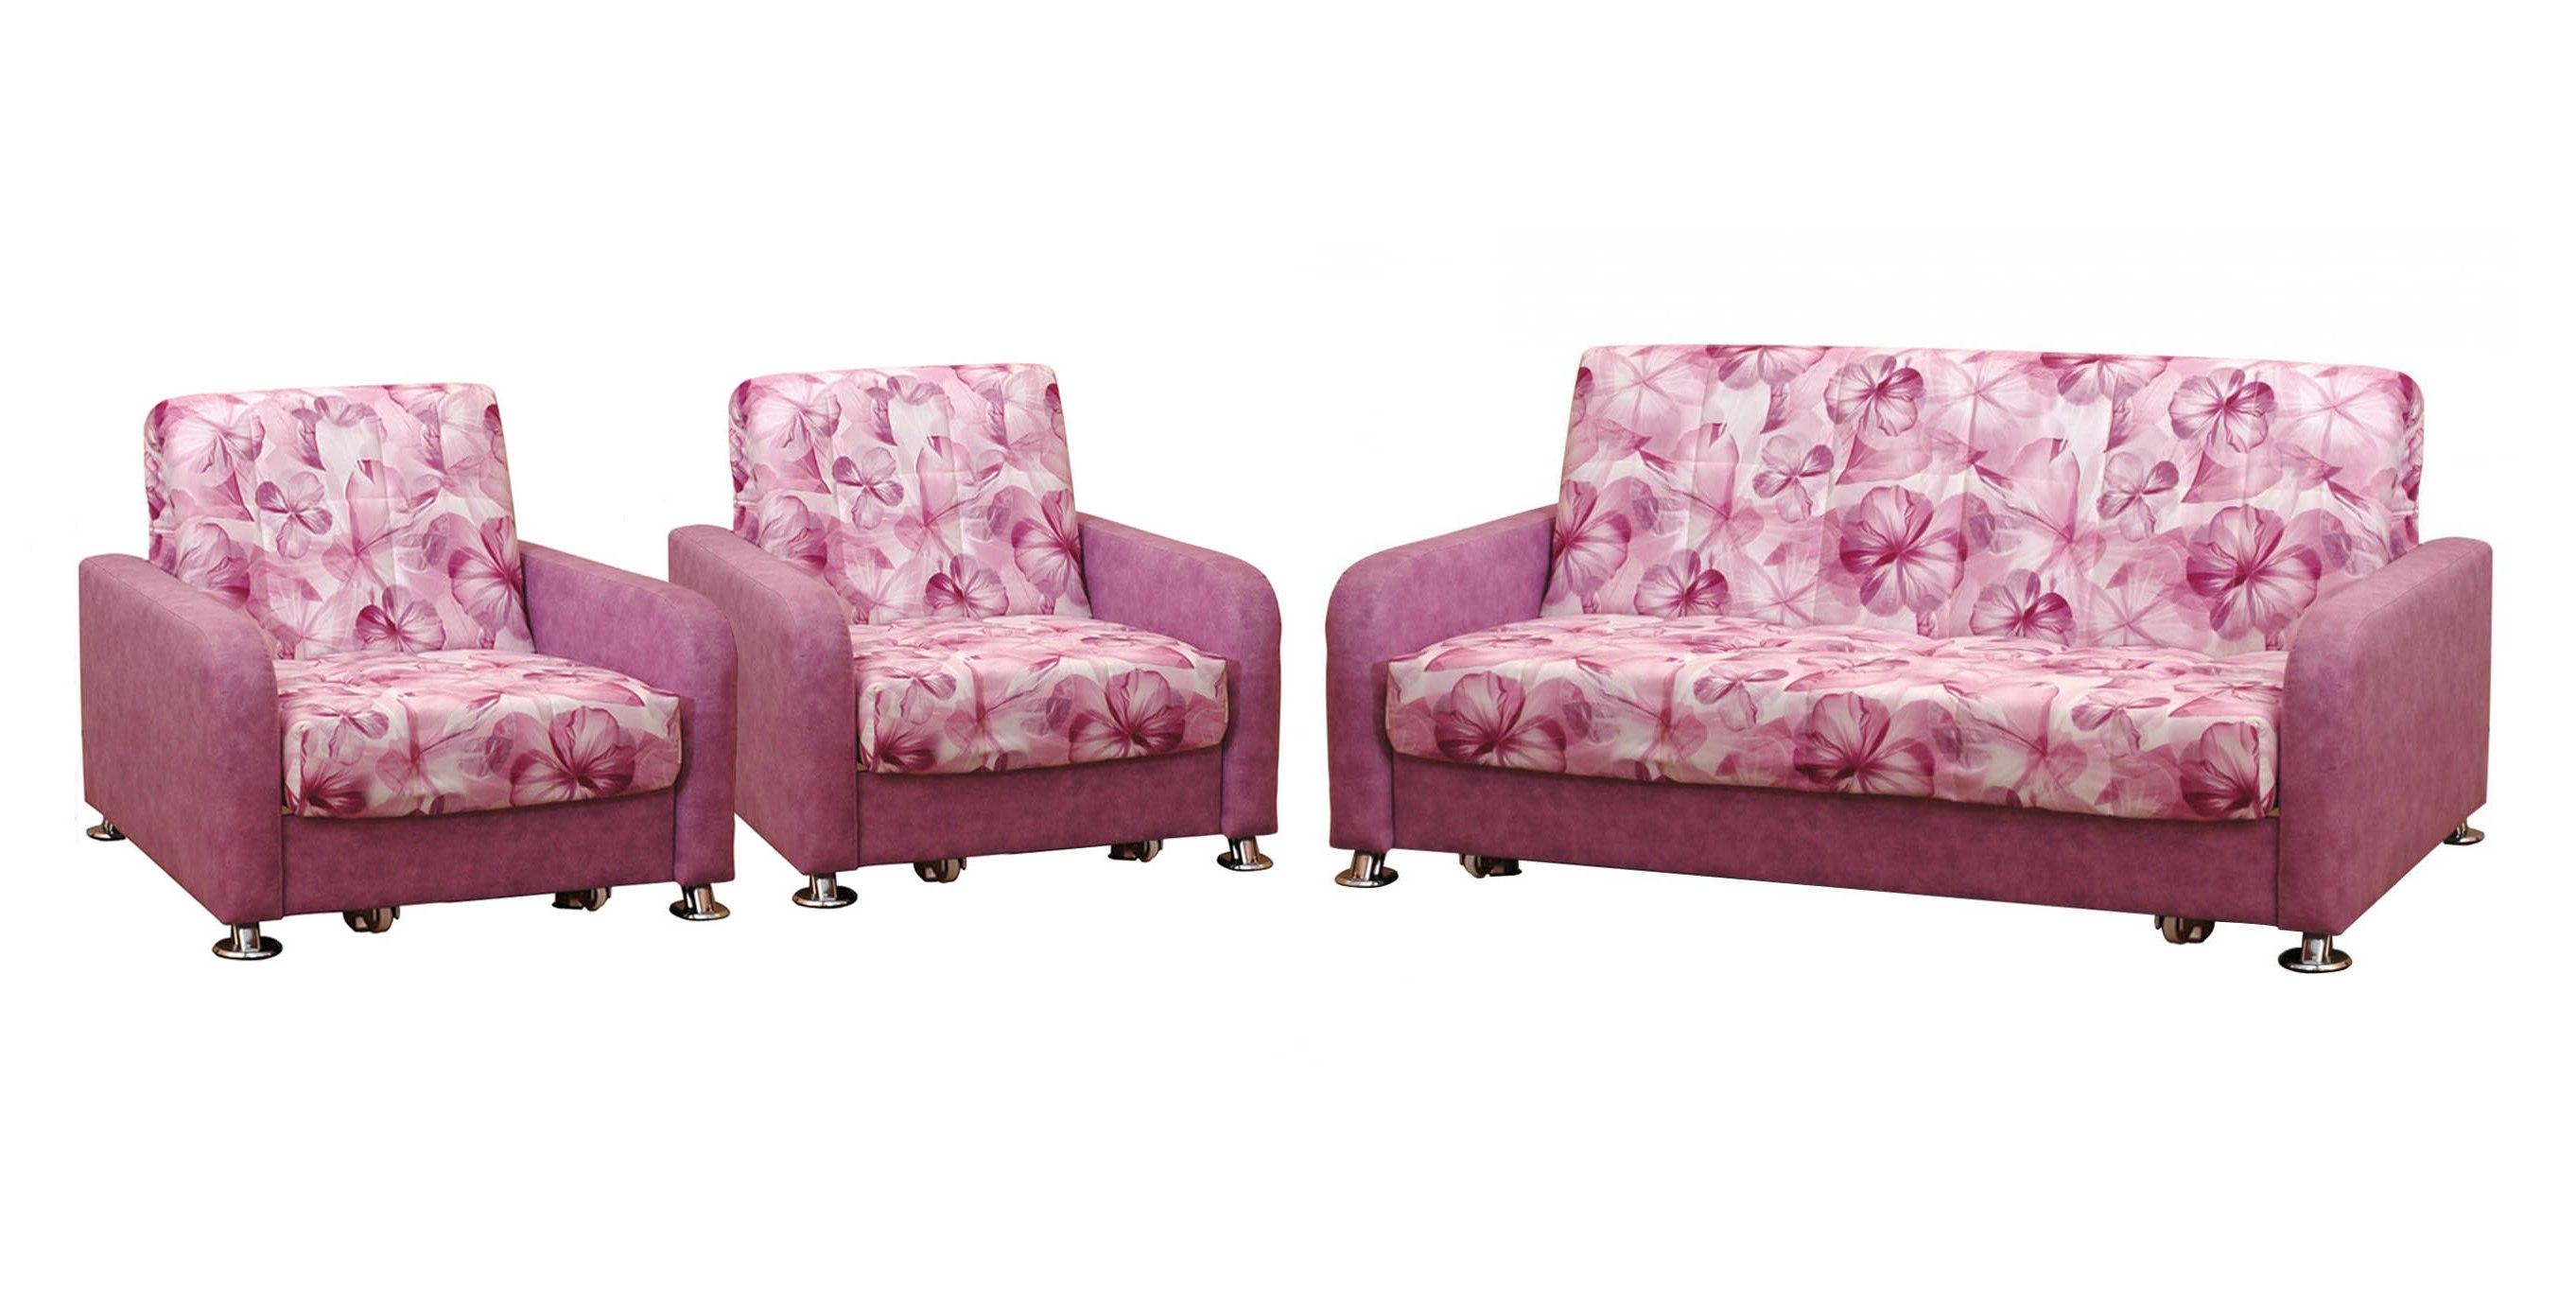 Комплект мягкой мебели Аккорд хром